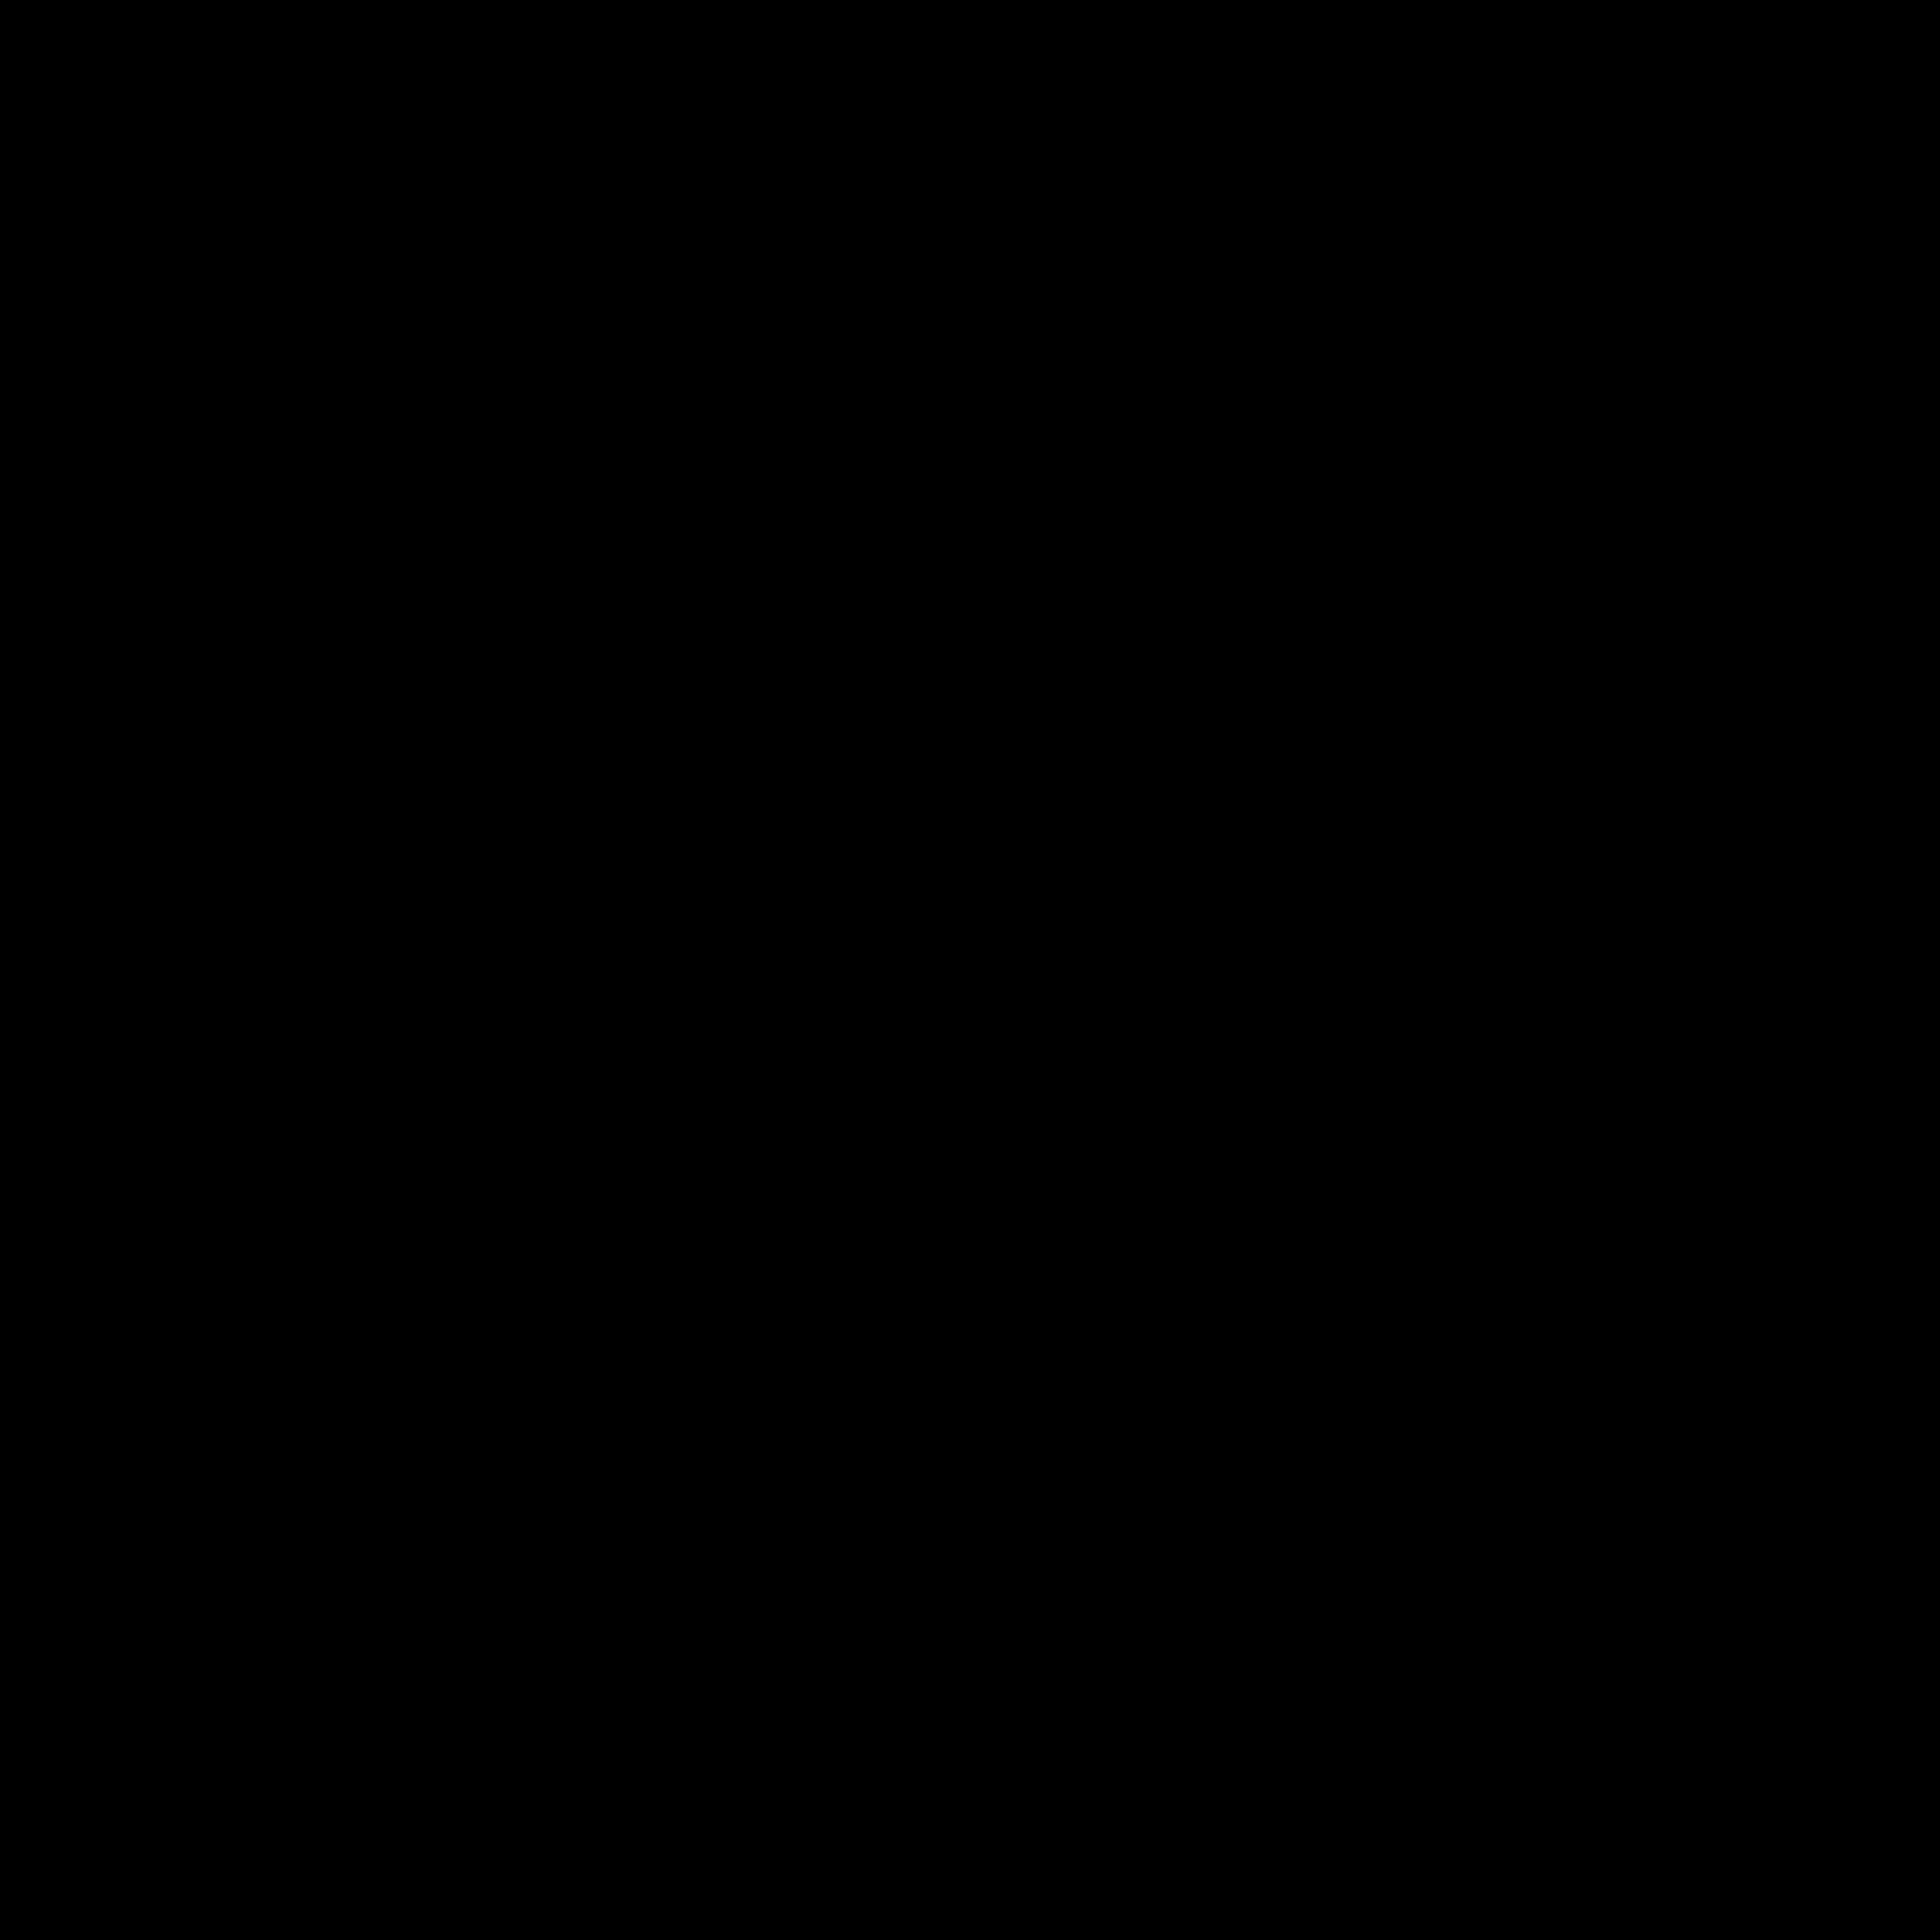 sensore CMOS APS-H